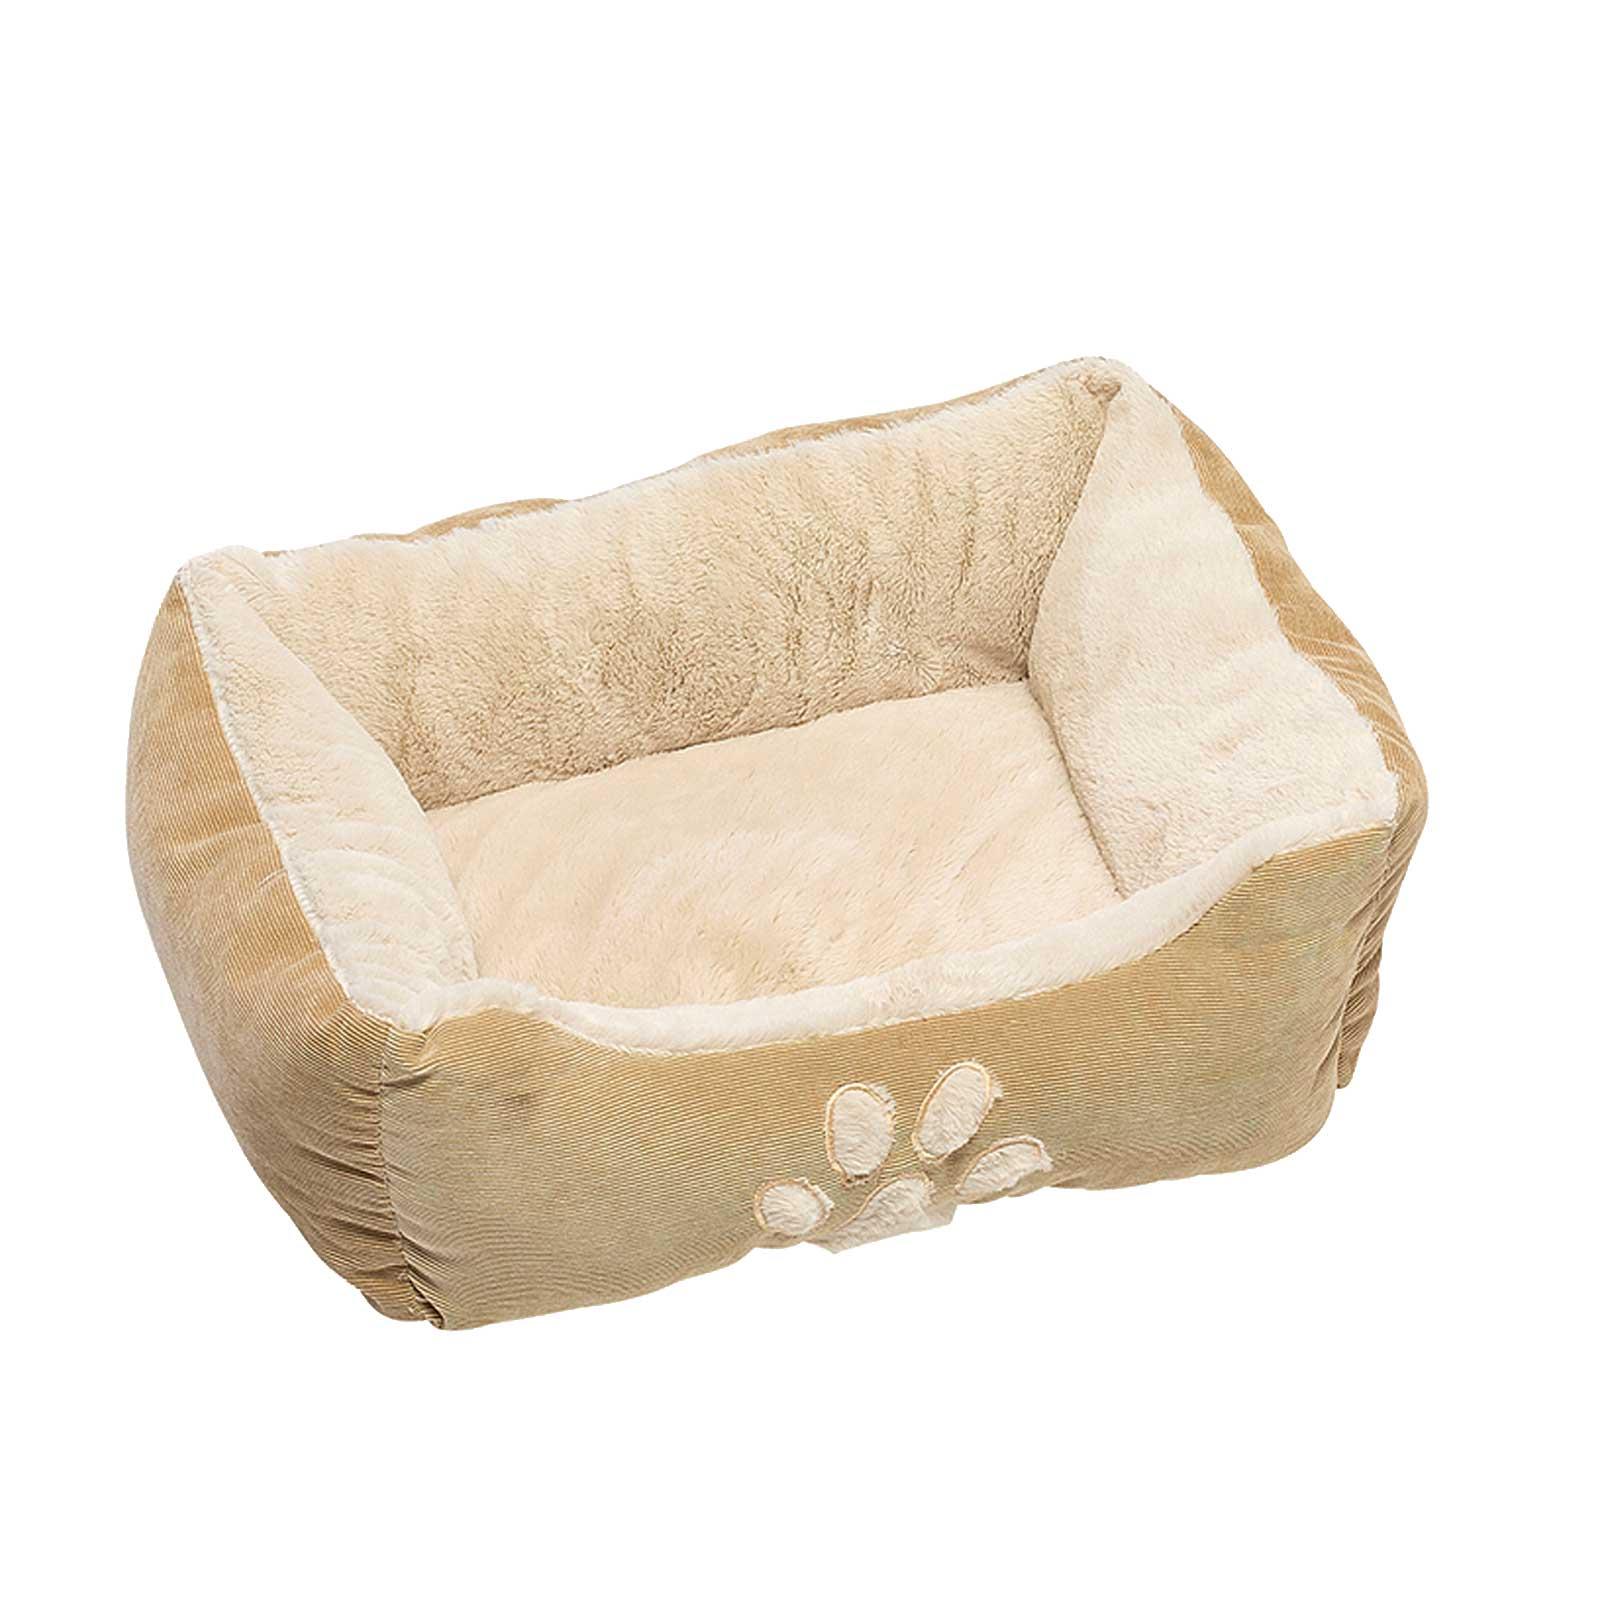 Hunde Luxus Kissen Hundebett 47 x 37 x 17 cm, Beige